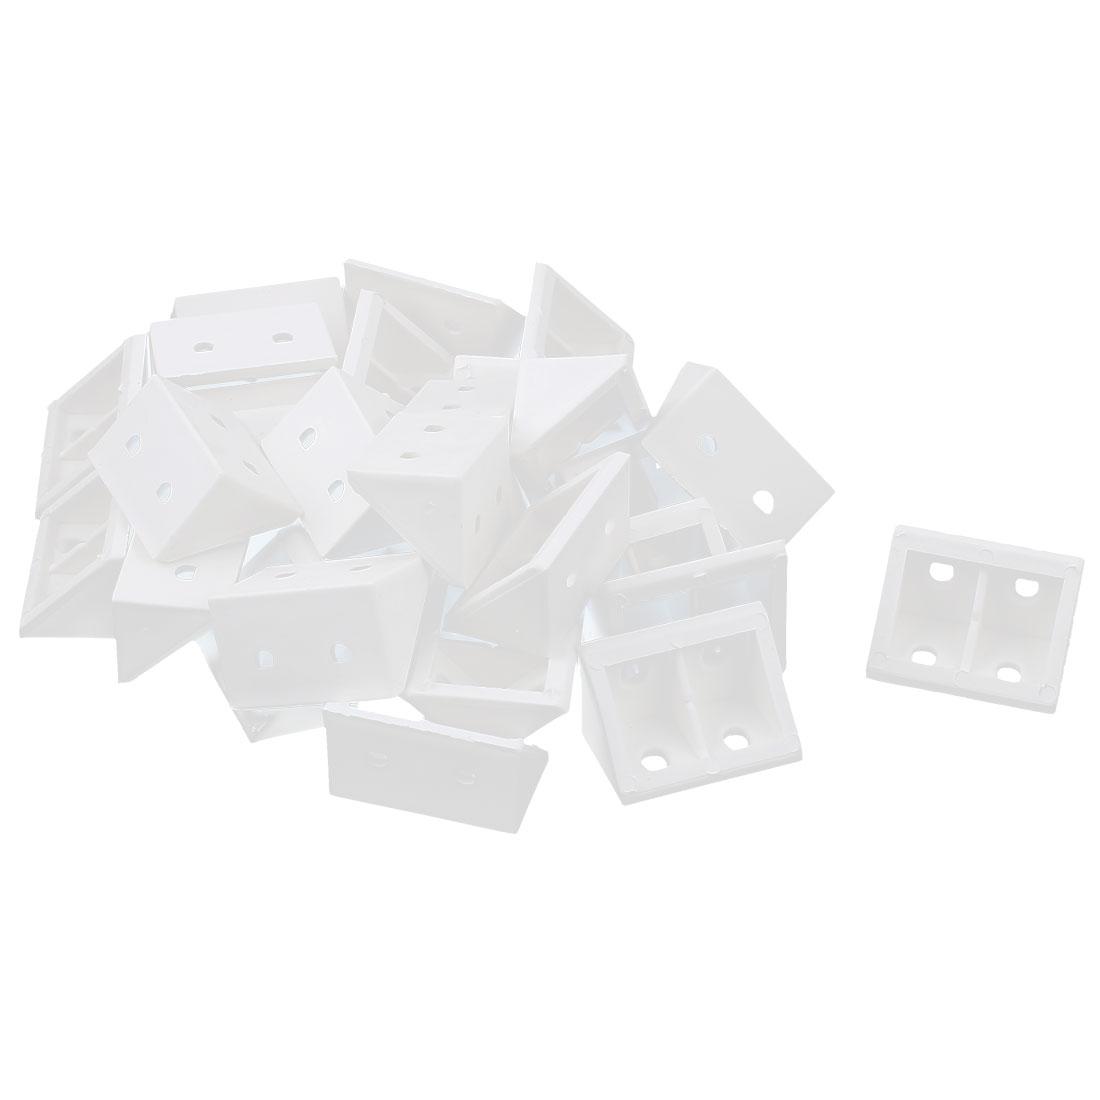 30 Pcs 90 Degree White Plastic Furniture Closet Cabinet Corner Connectors